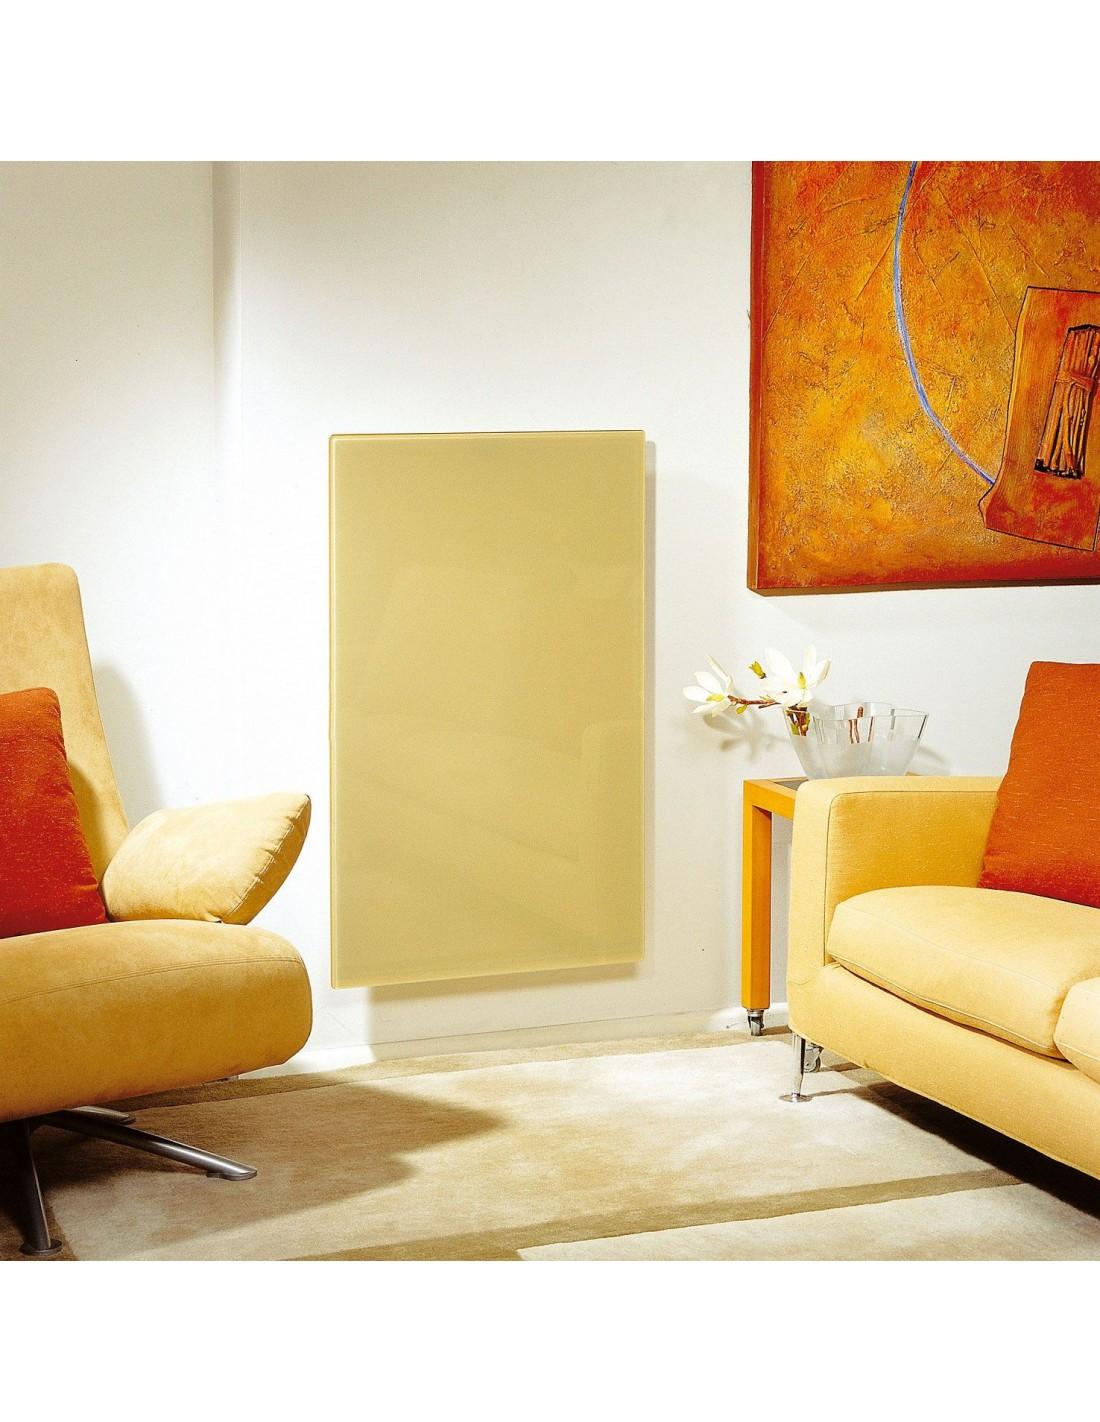 Radiateur Solaris vertical 63 1000W beige brillant de la marque Fondis - Valente Design